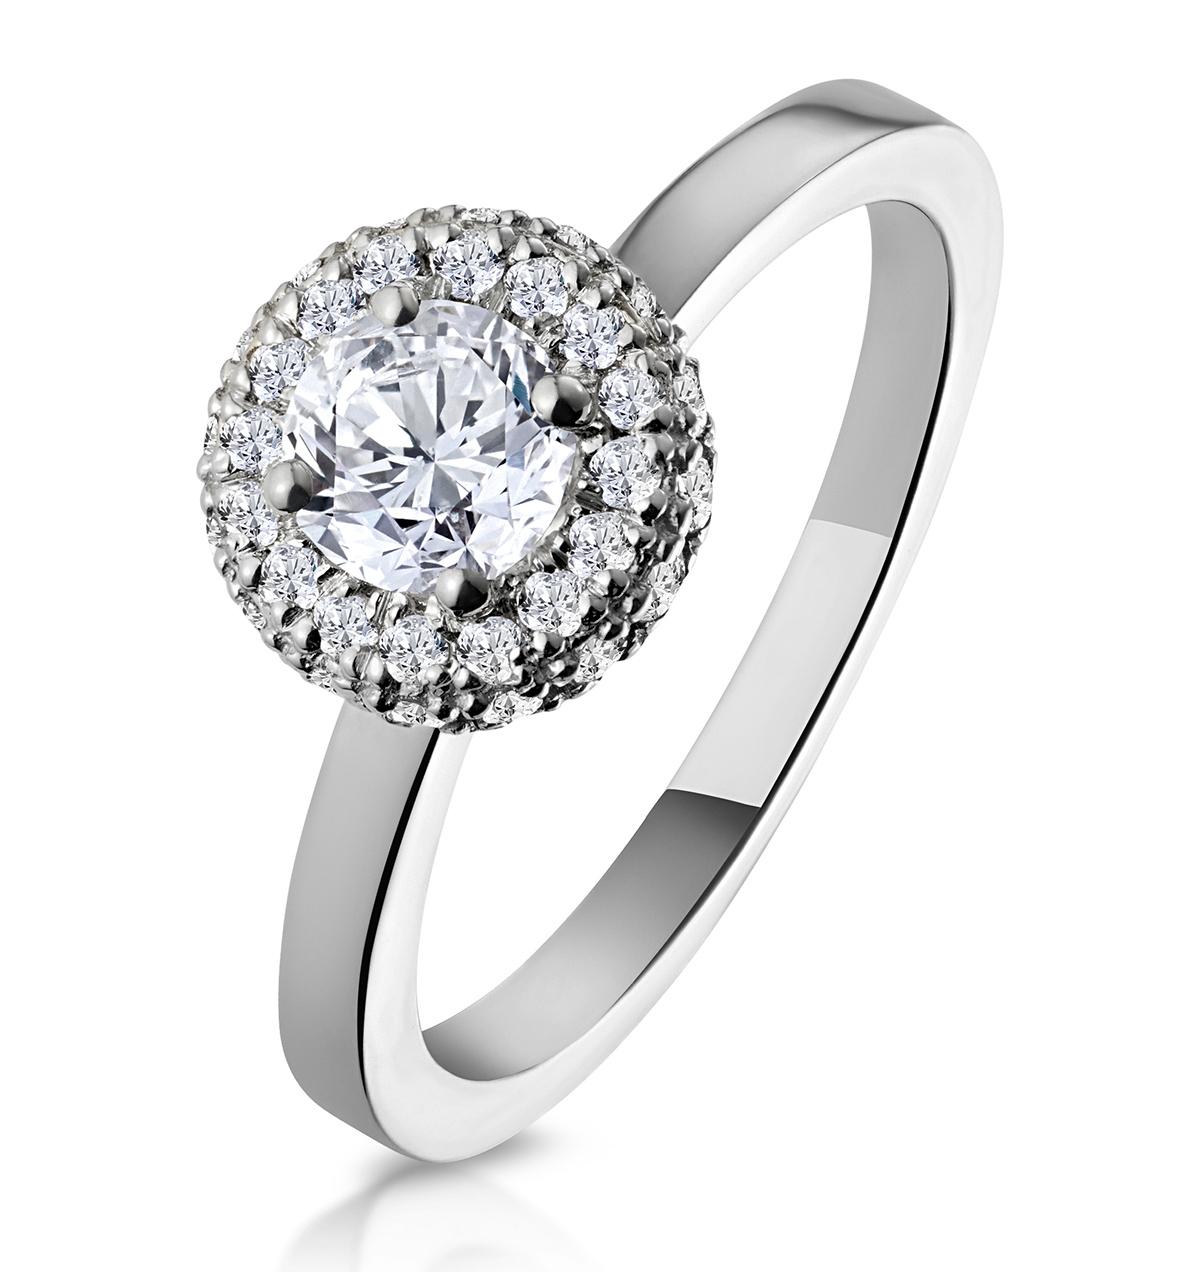 Eleanor GIA Diamond Halo Engagement Ring in Platinum 0.65ct G/VS1 - image 1